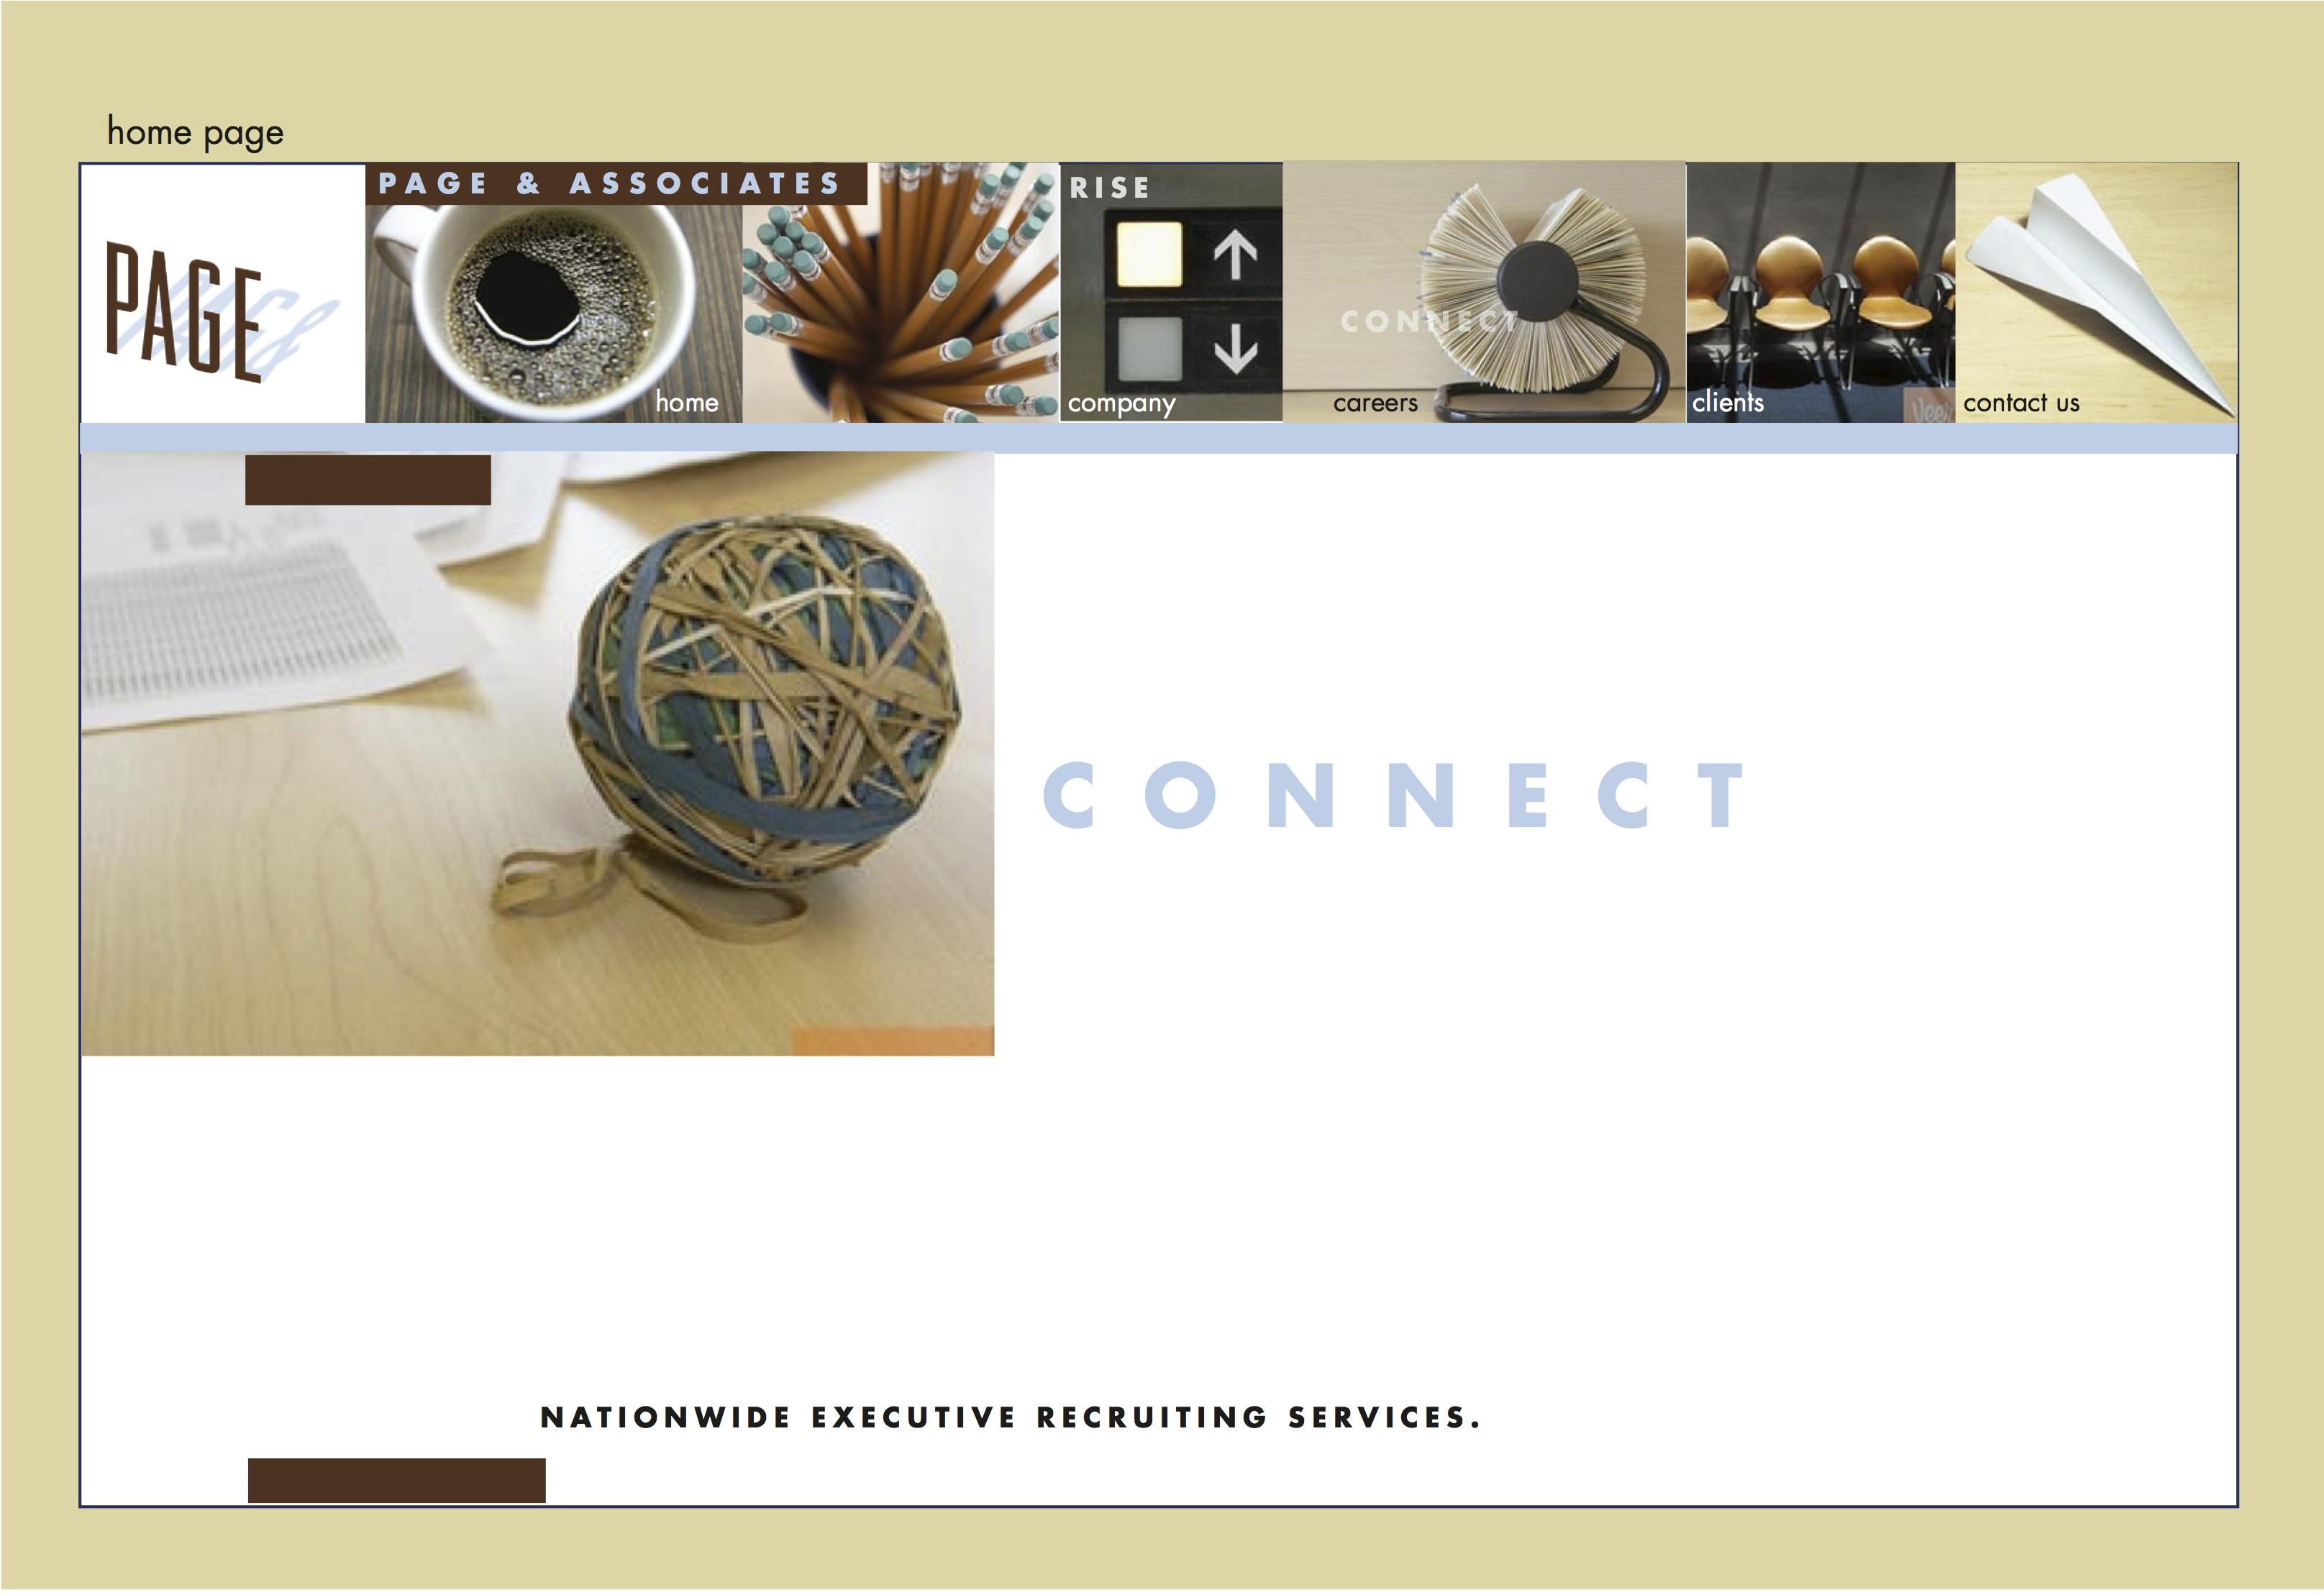 Branding - Page & Associates